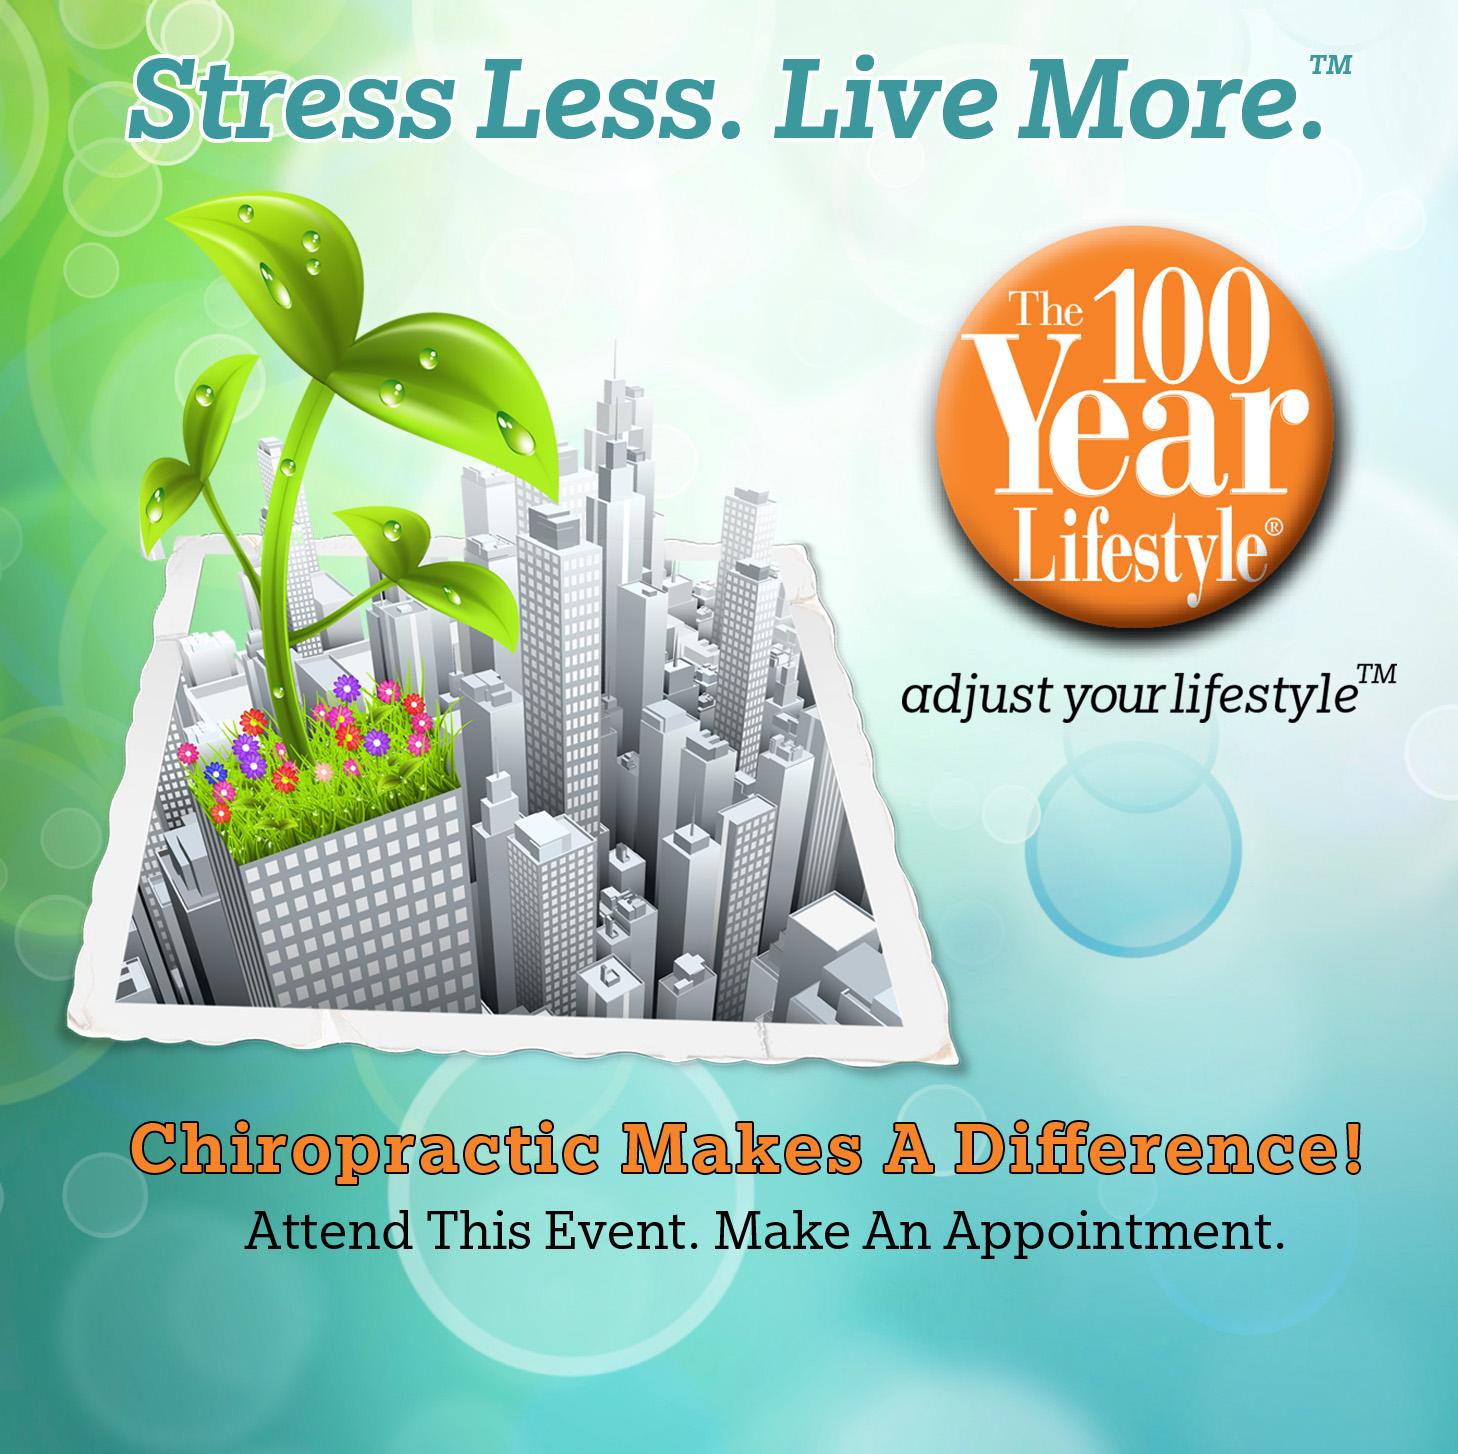 Stress Less, Live More